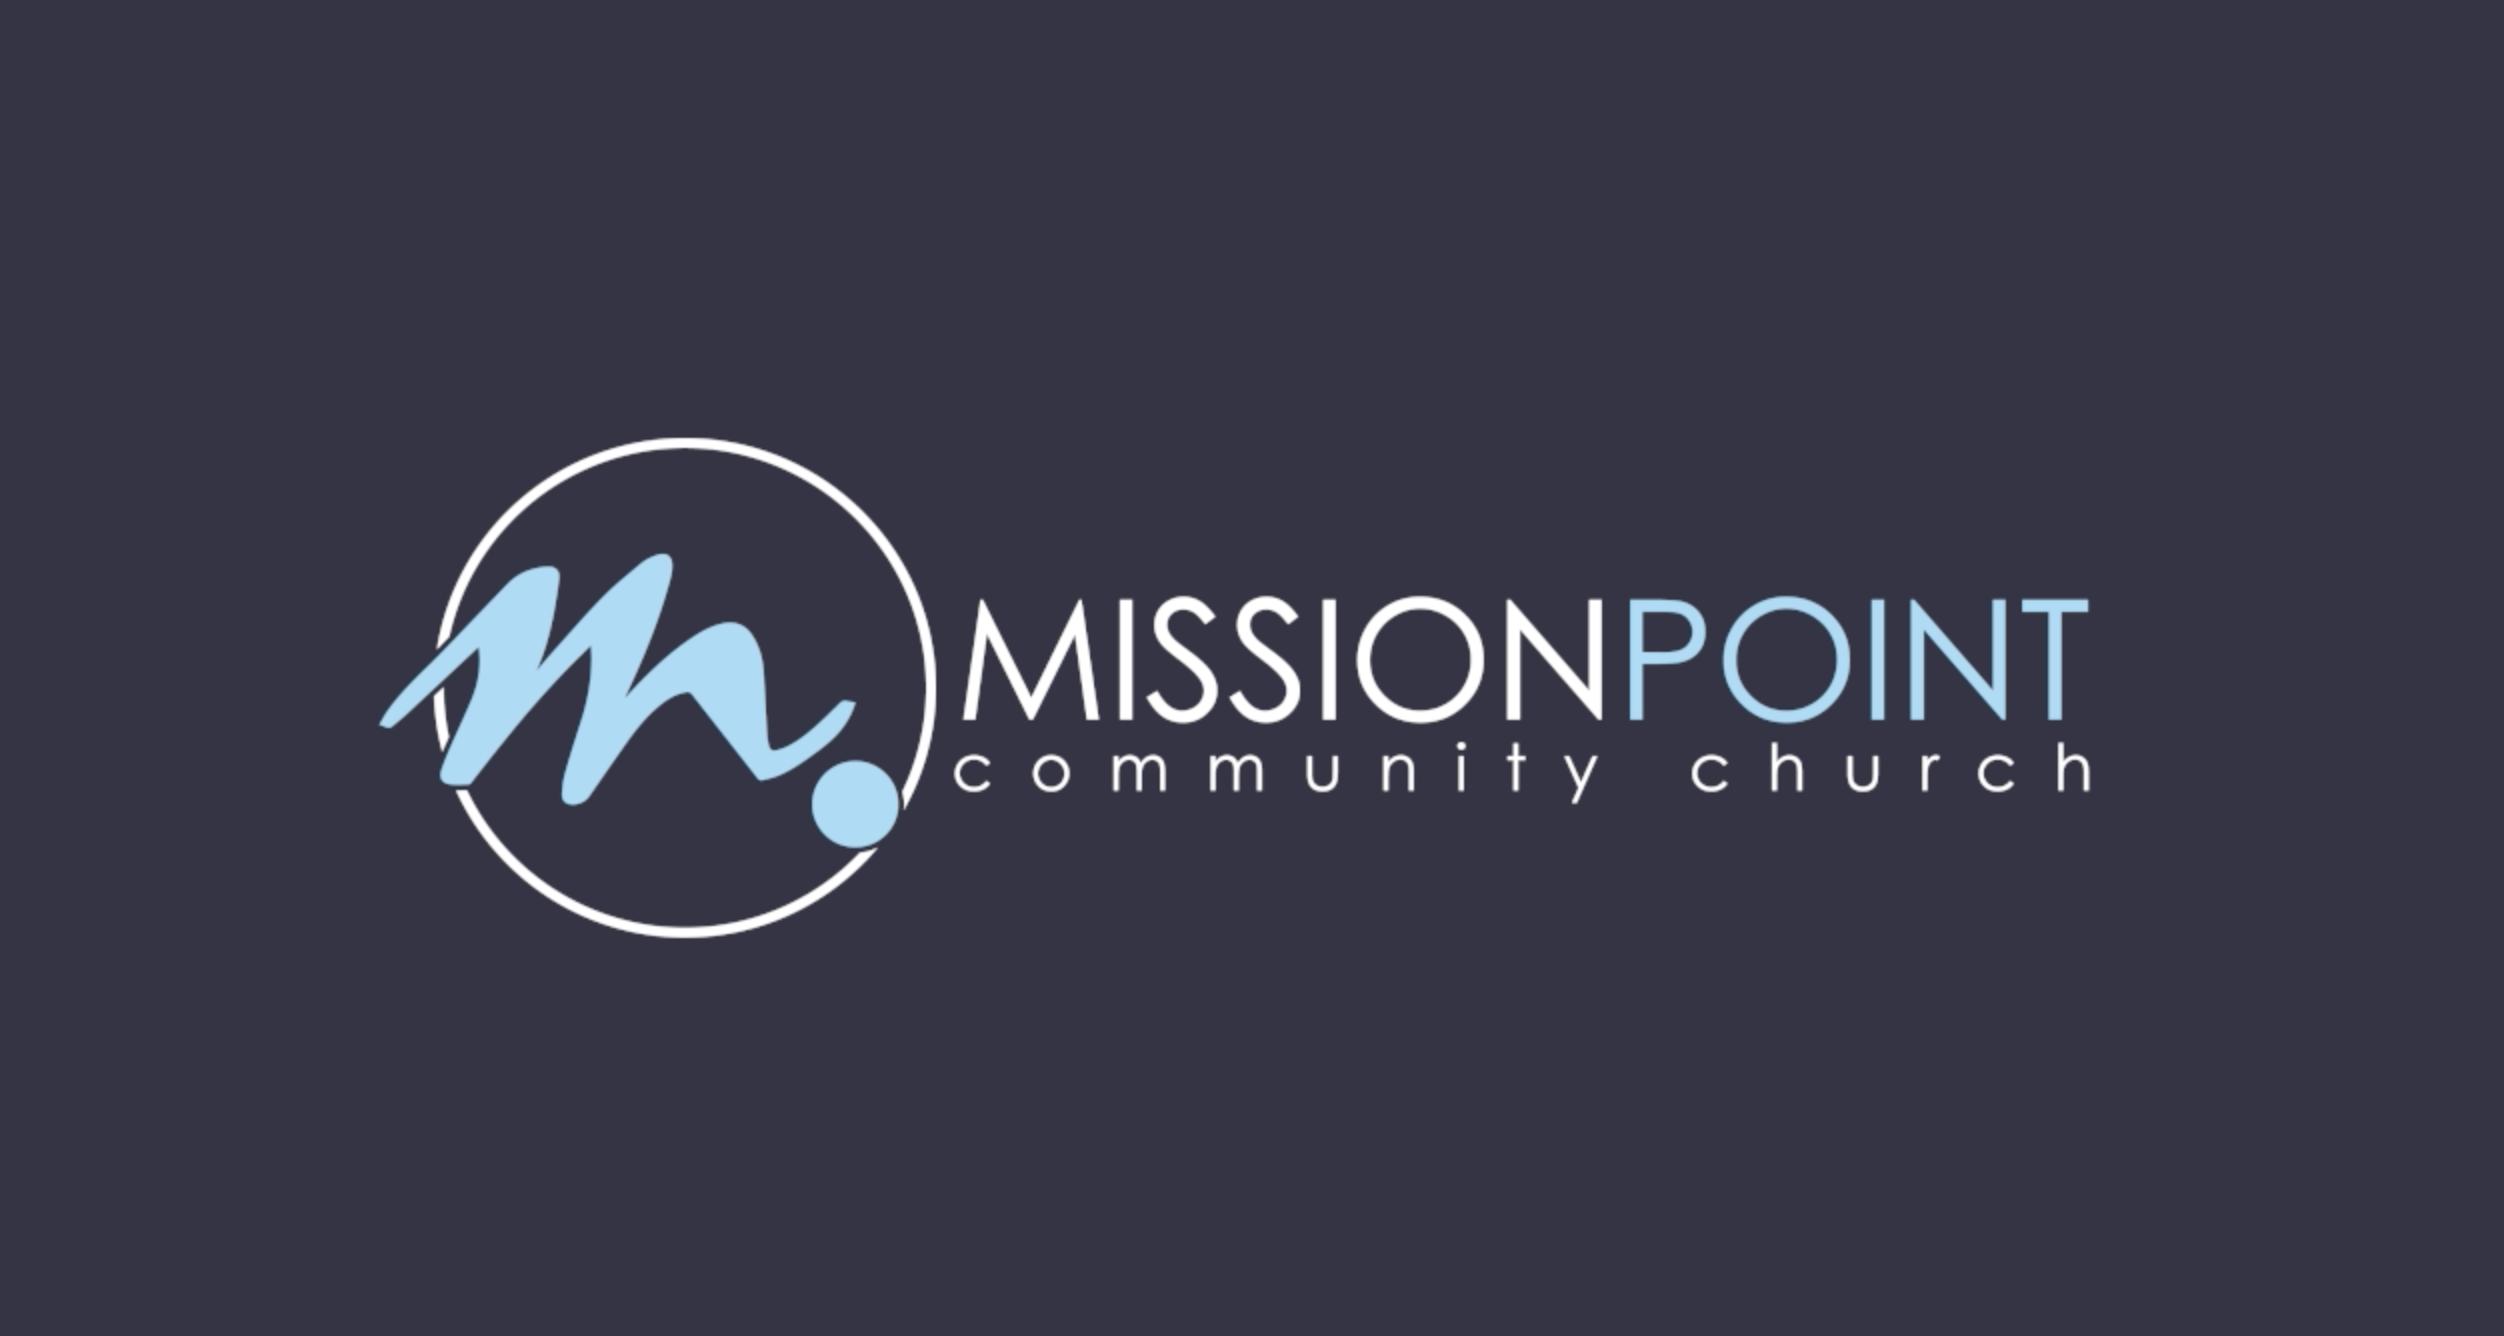 Mission Point Community Church